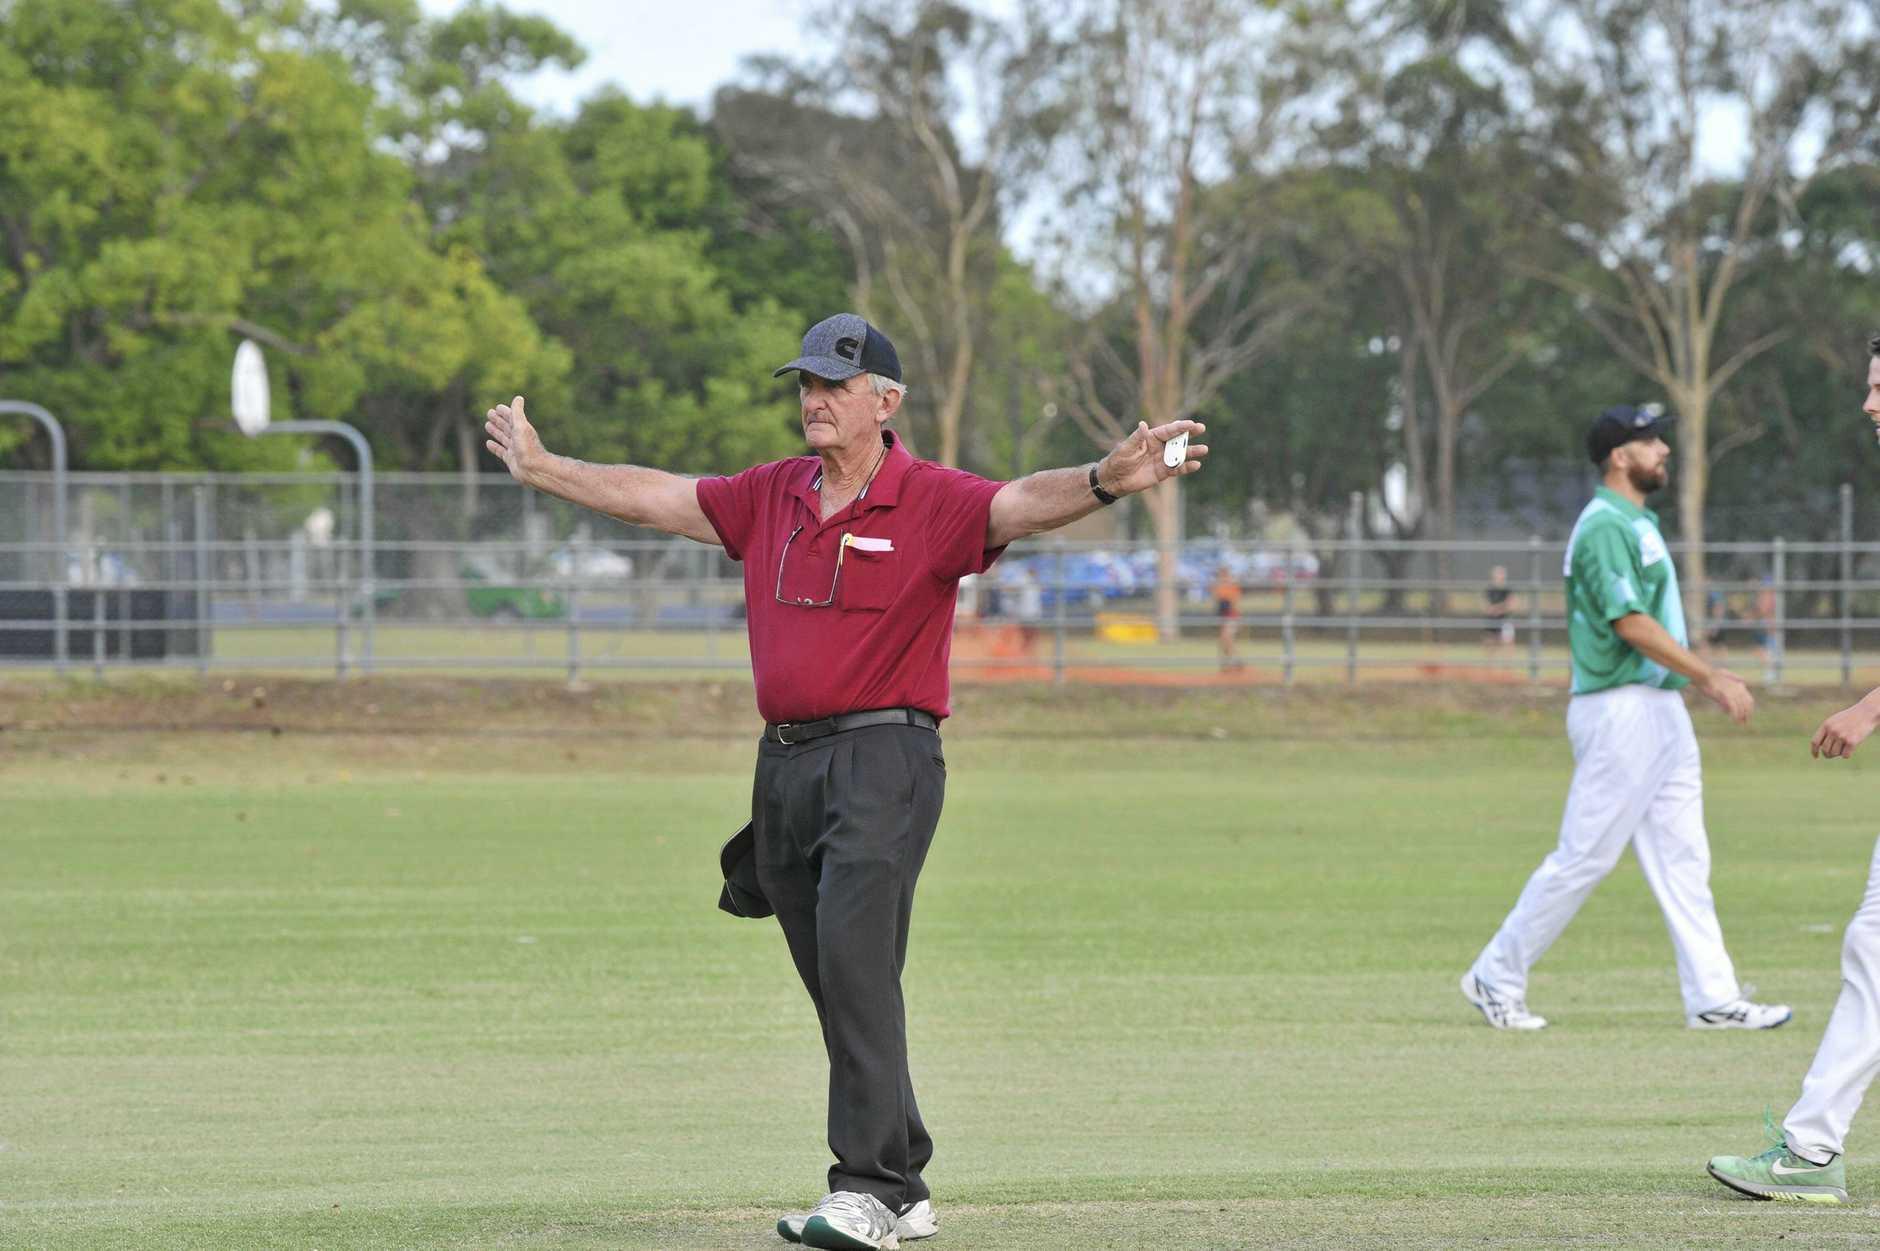 BIG CONTRIBUTION: Umpire Bruce Baxter .